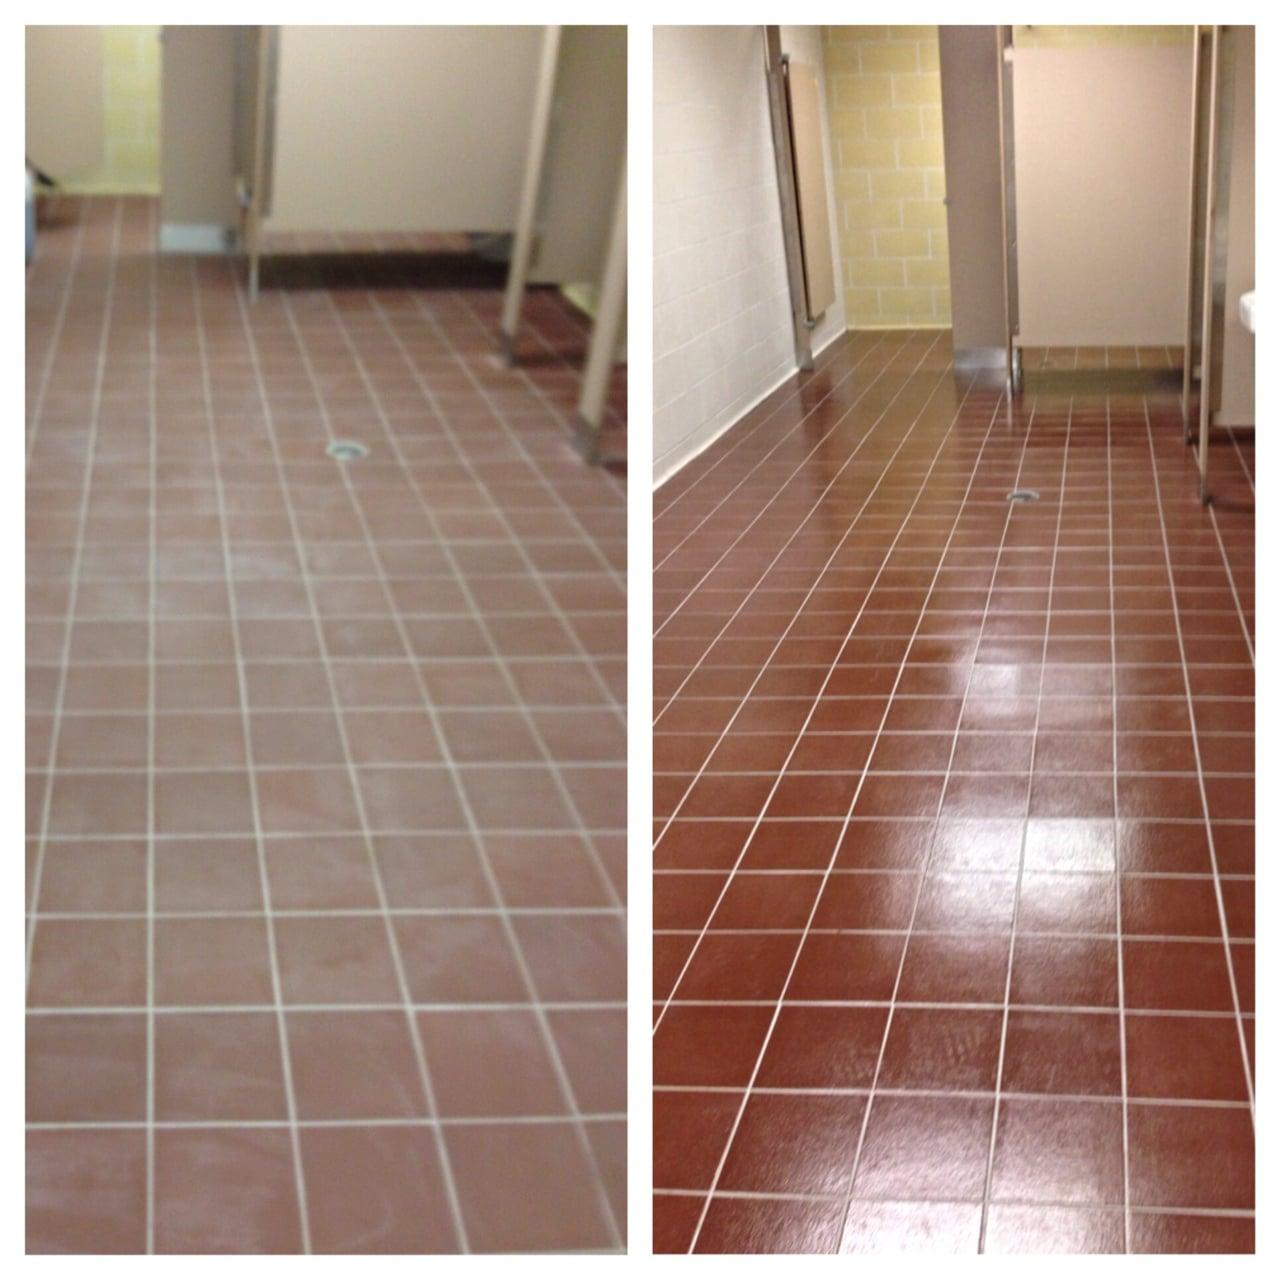 Before & After Tile Cleaning in Denver